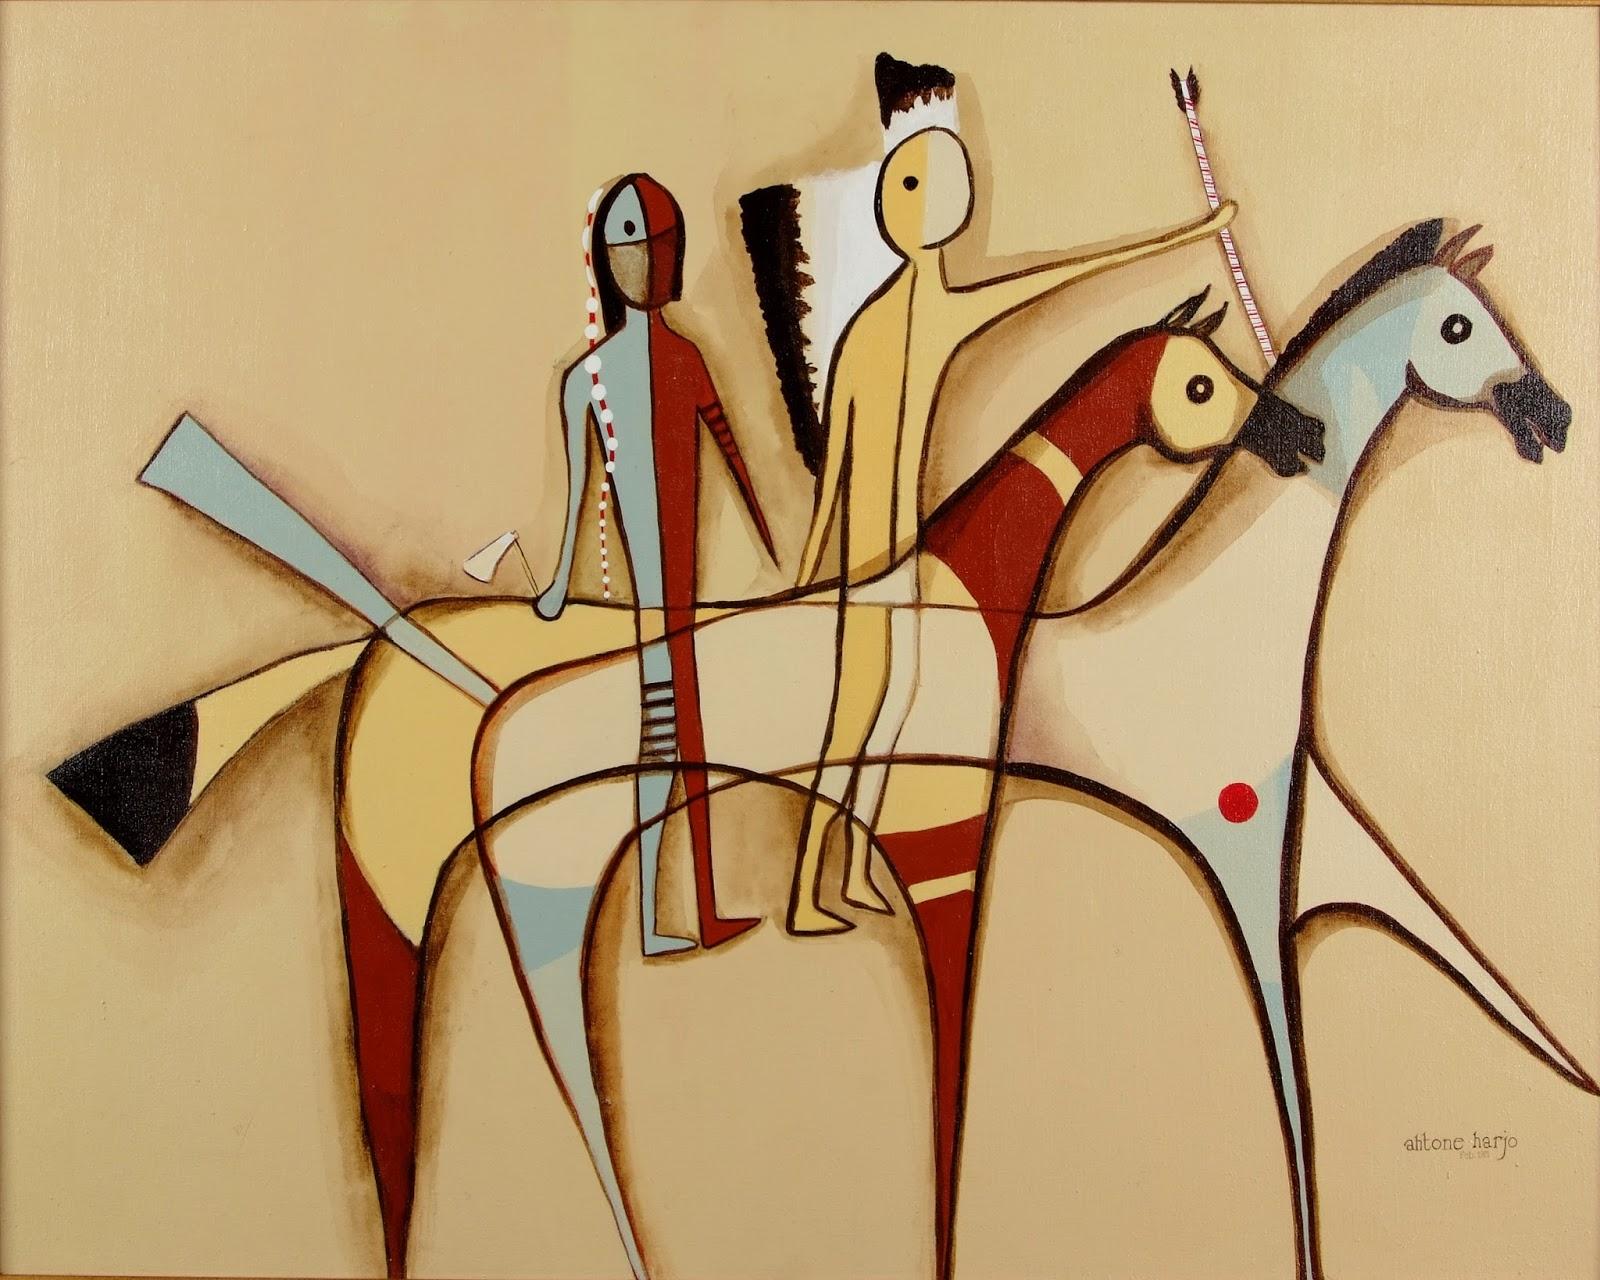 The Ledger Art Of Sharron Ahtone Harjo